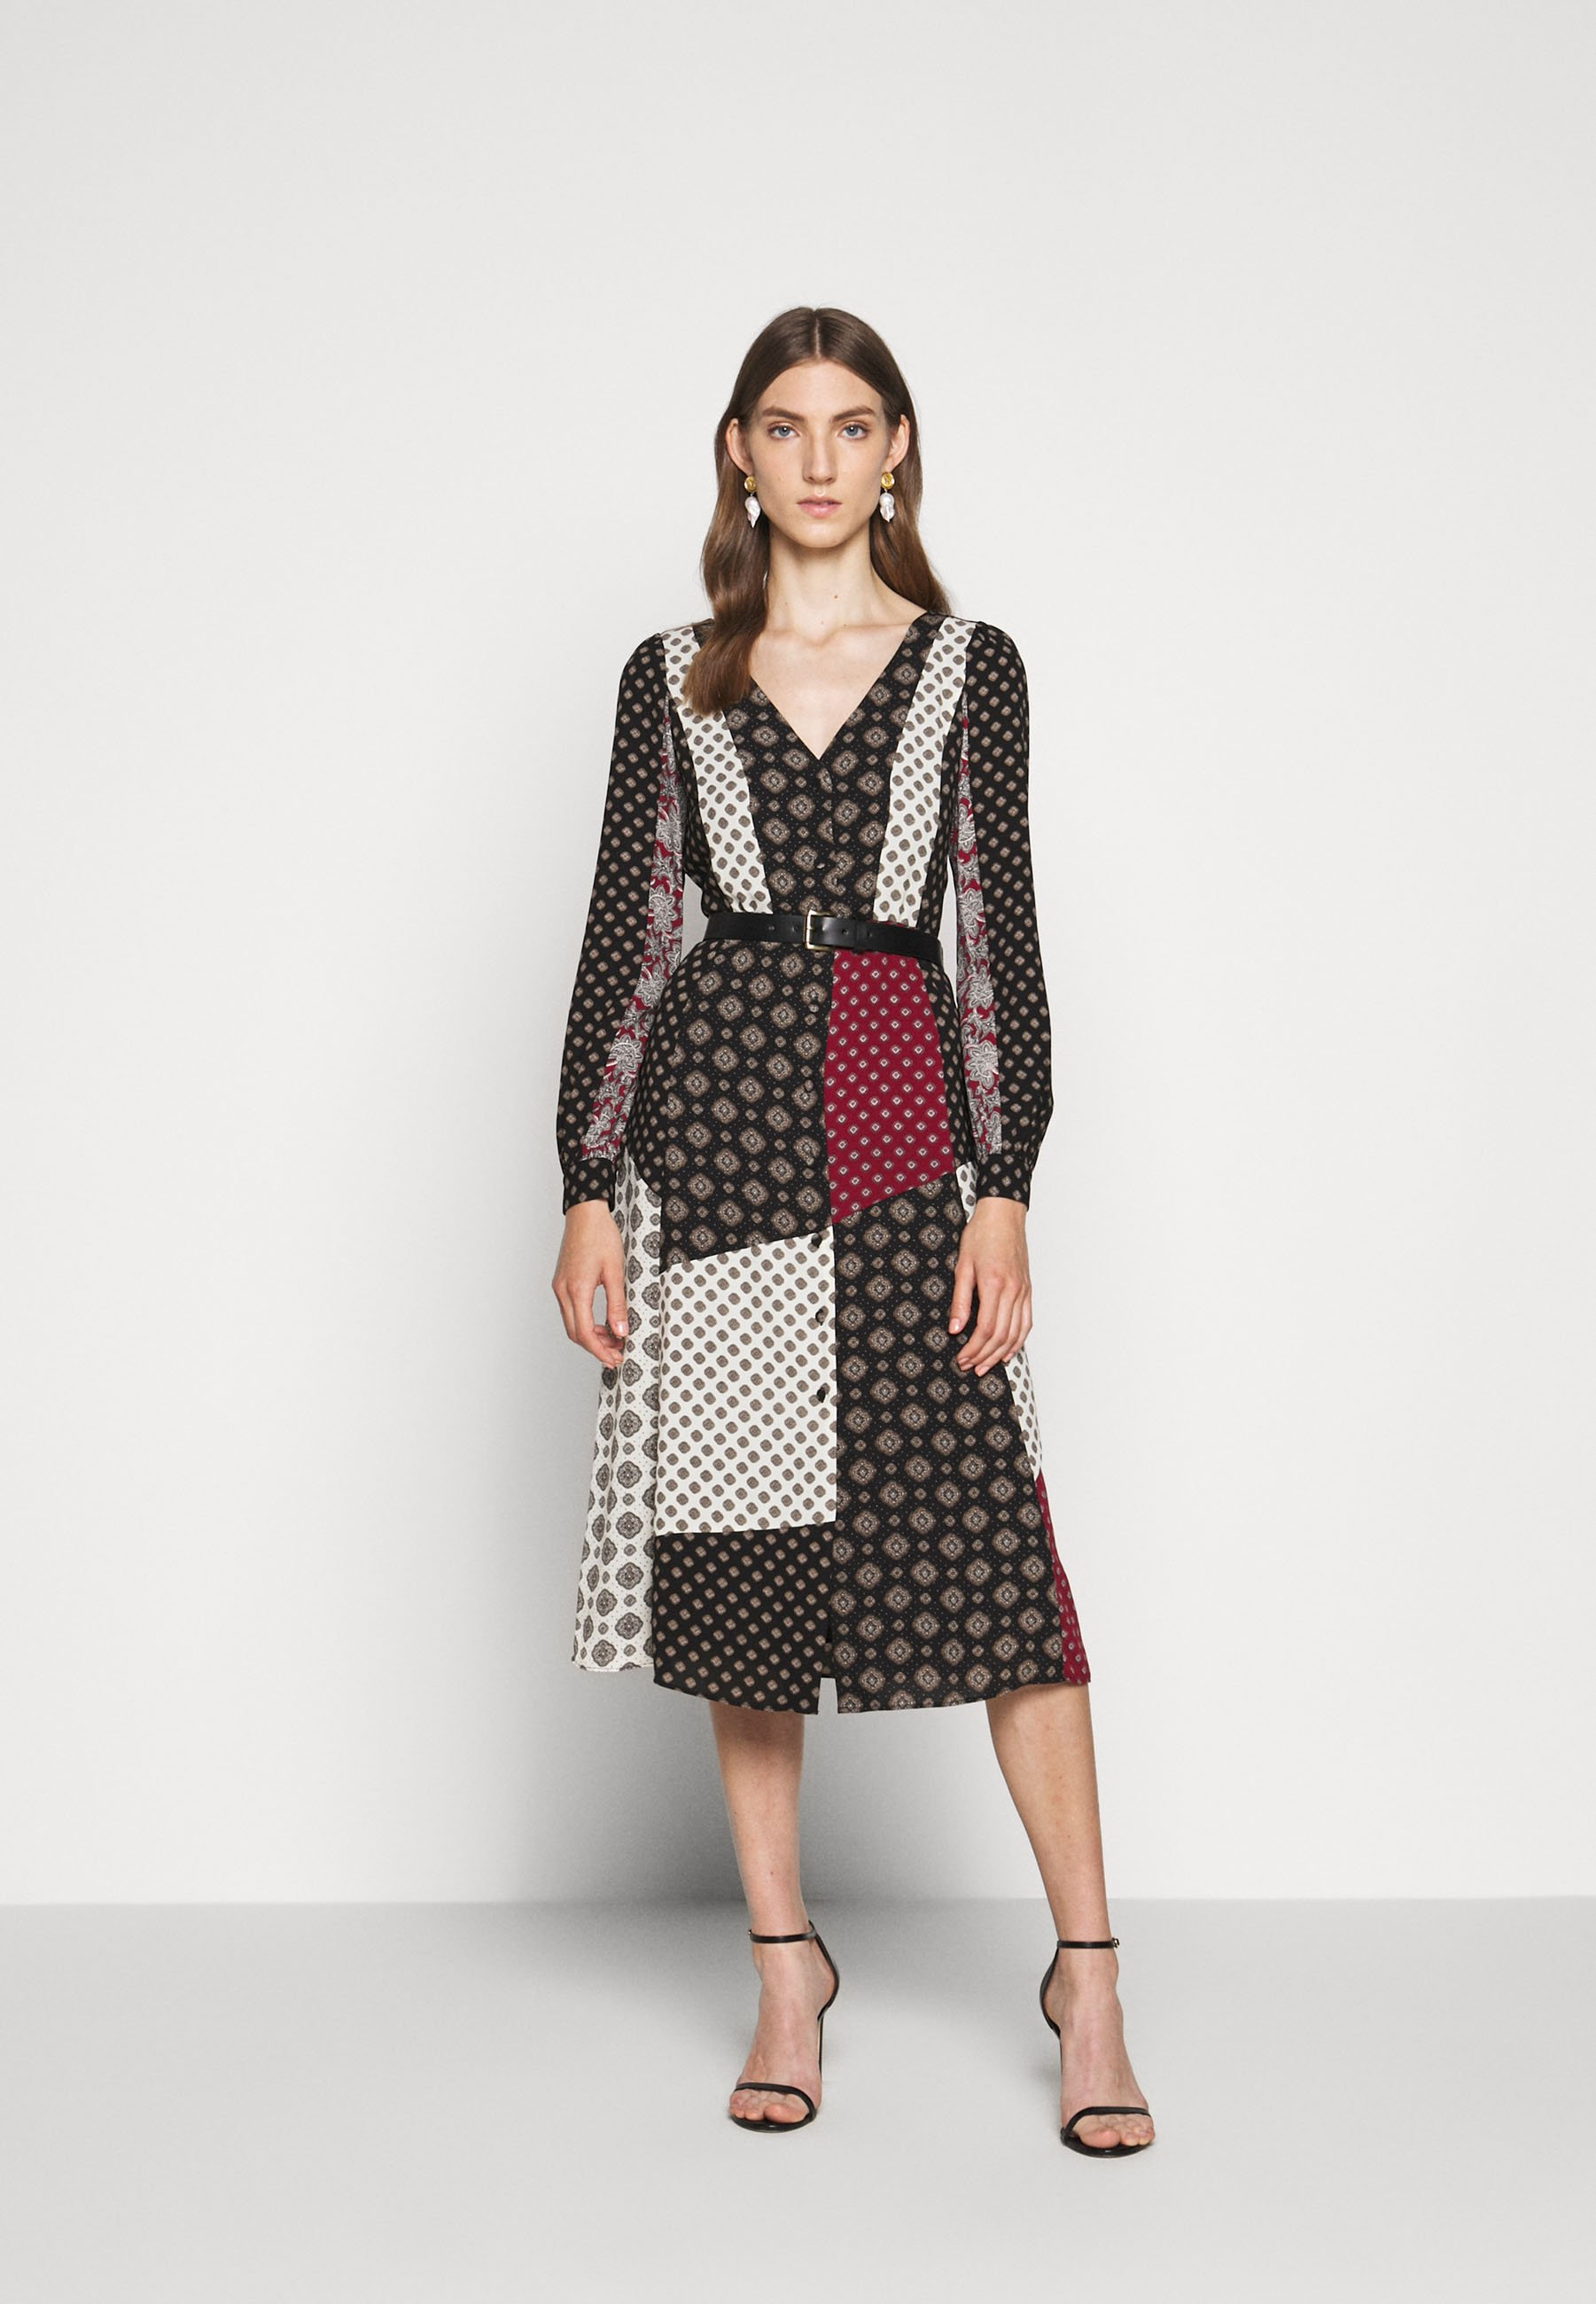 Fast Express Women's Clothing MICHAEL Michael Kors PRINT MIX MIDI Shirt dress black 9xcHnDGjD